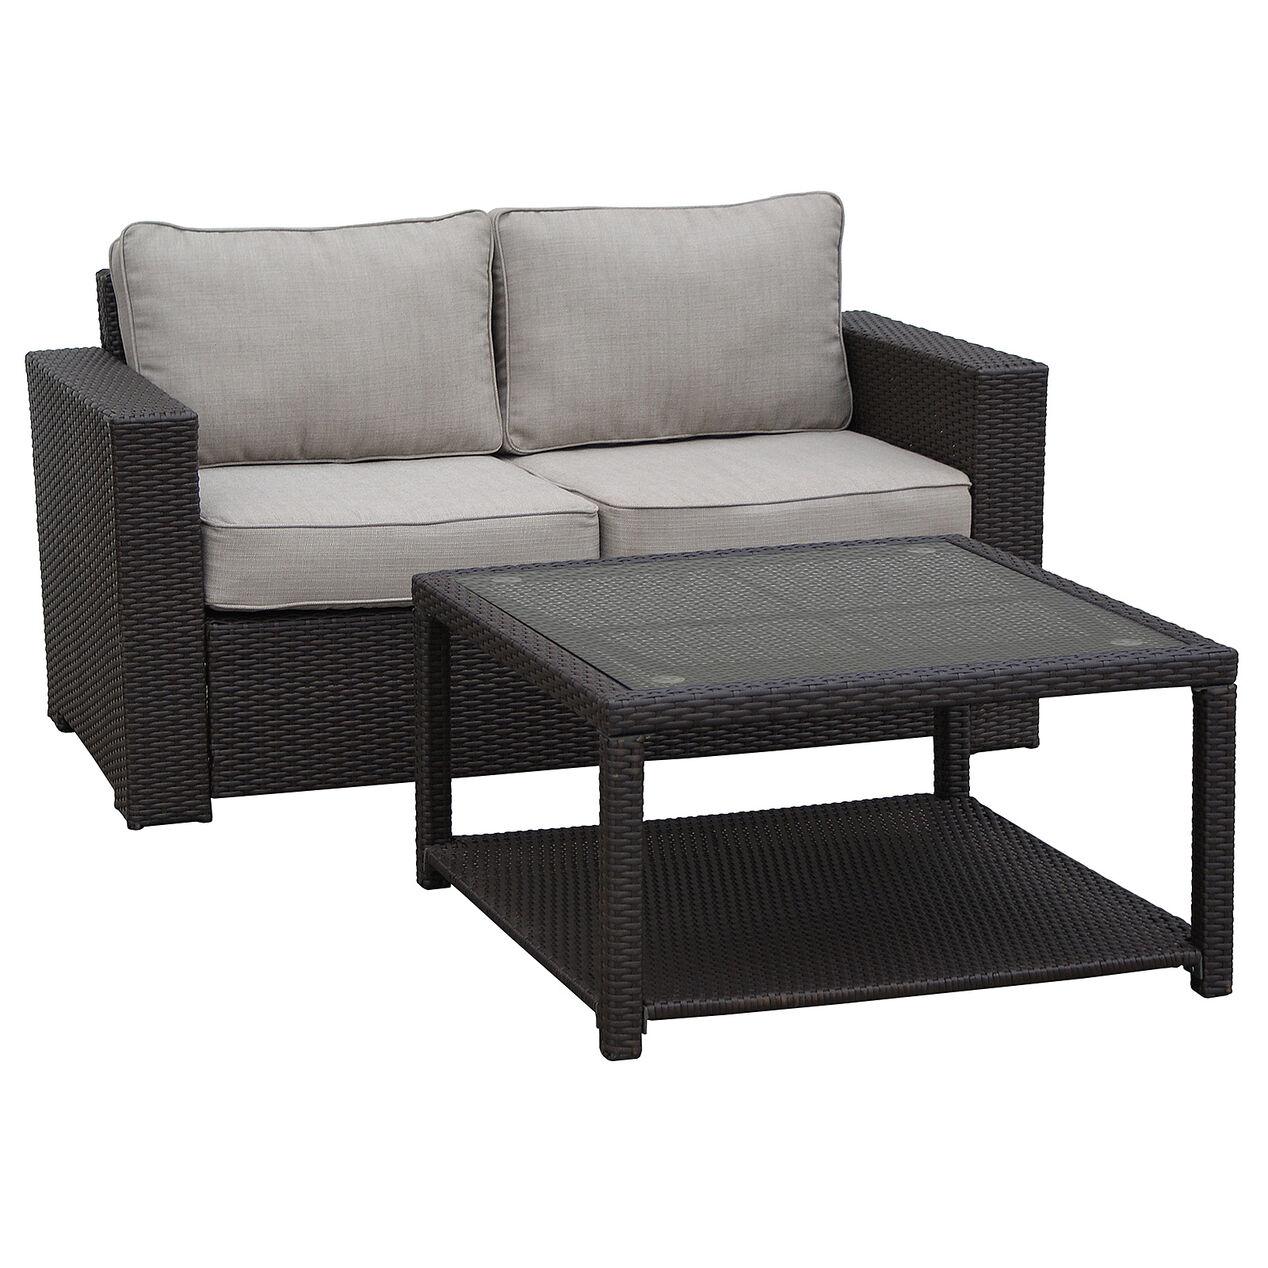 Folding Bed Fantastic Furniture On Vaporbullflcom